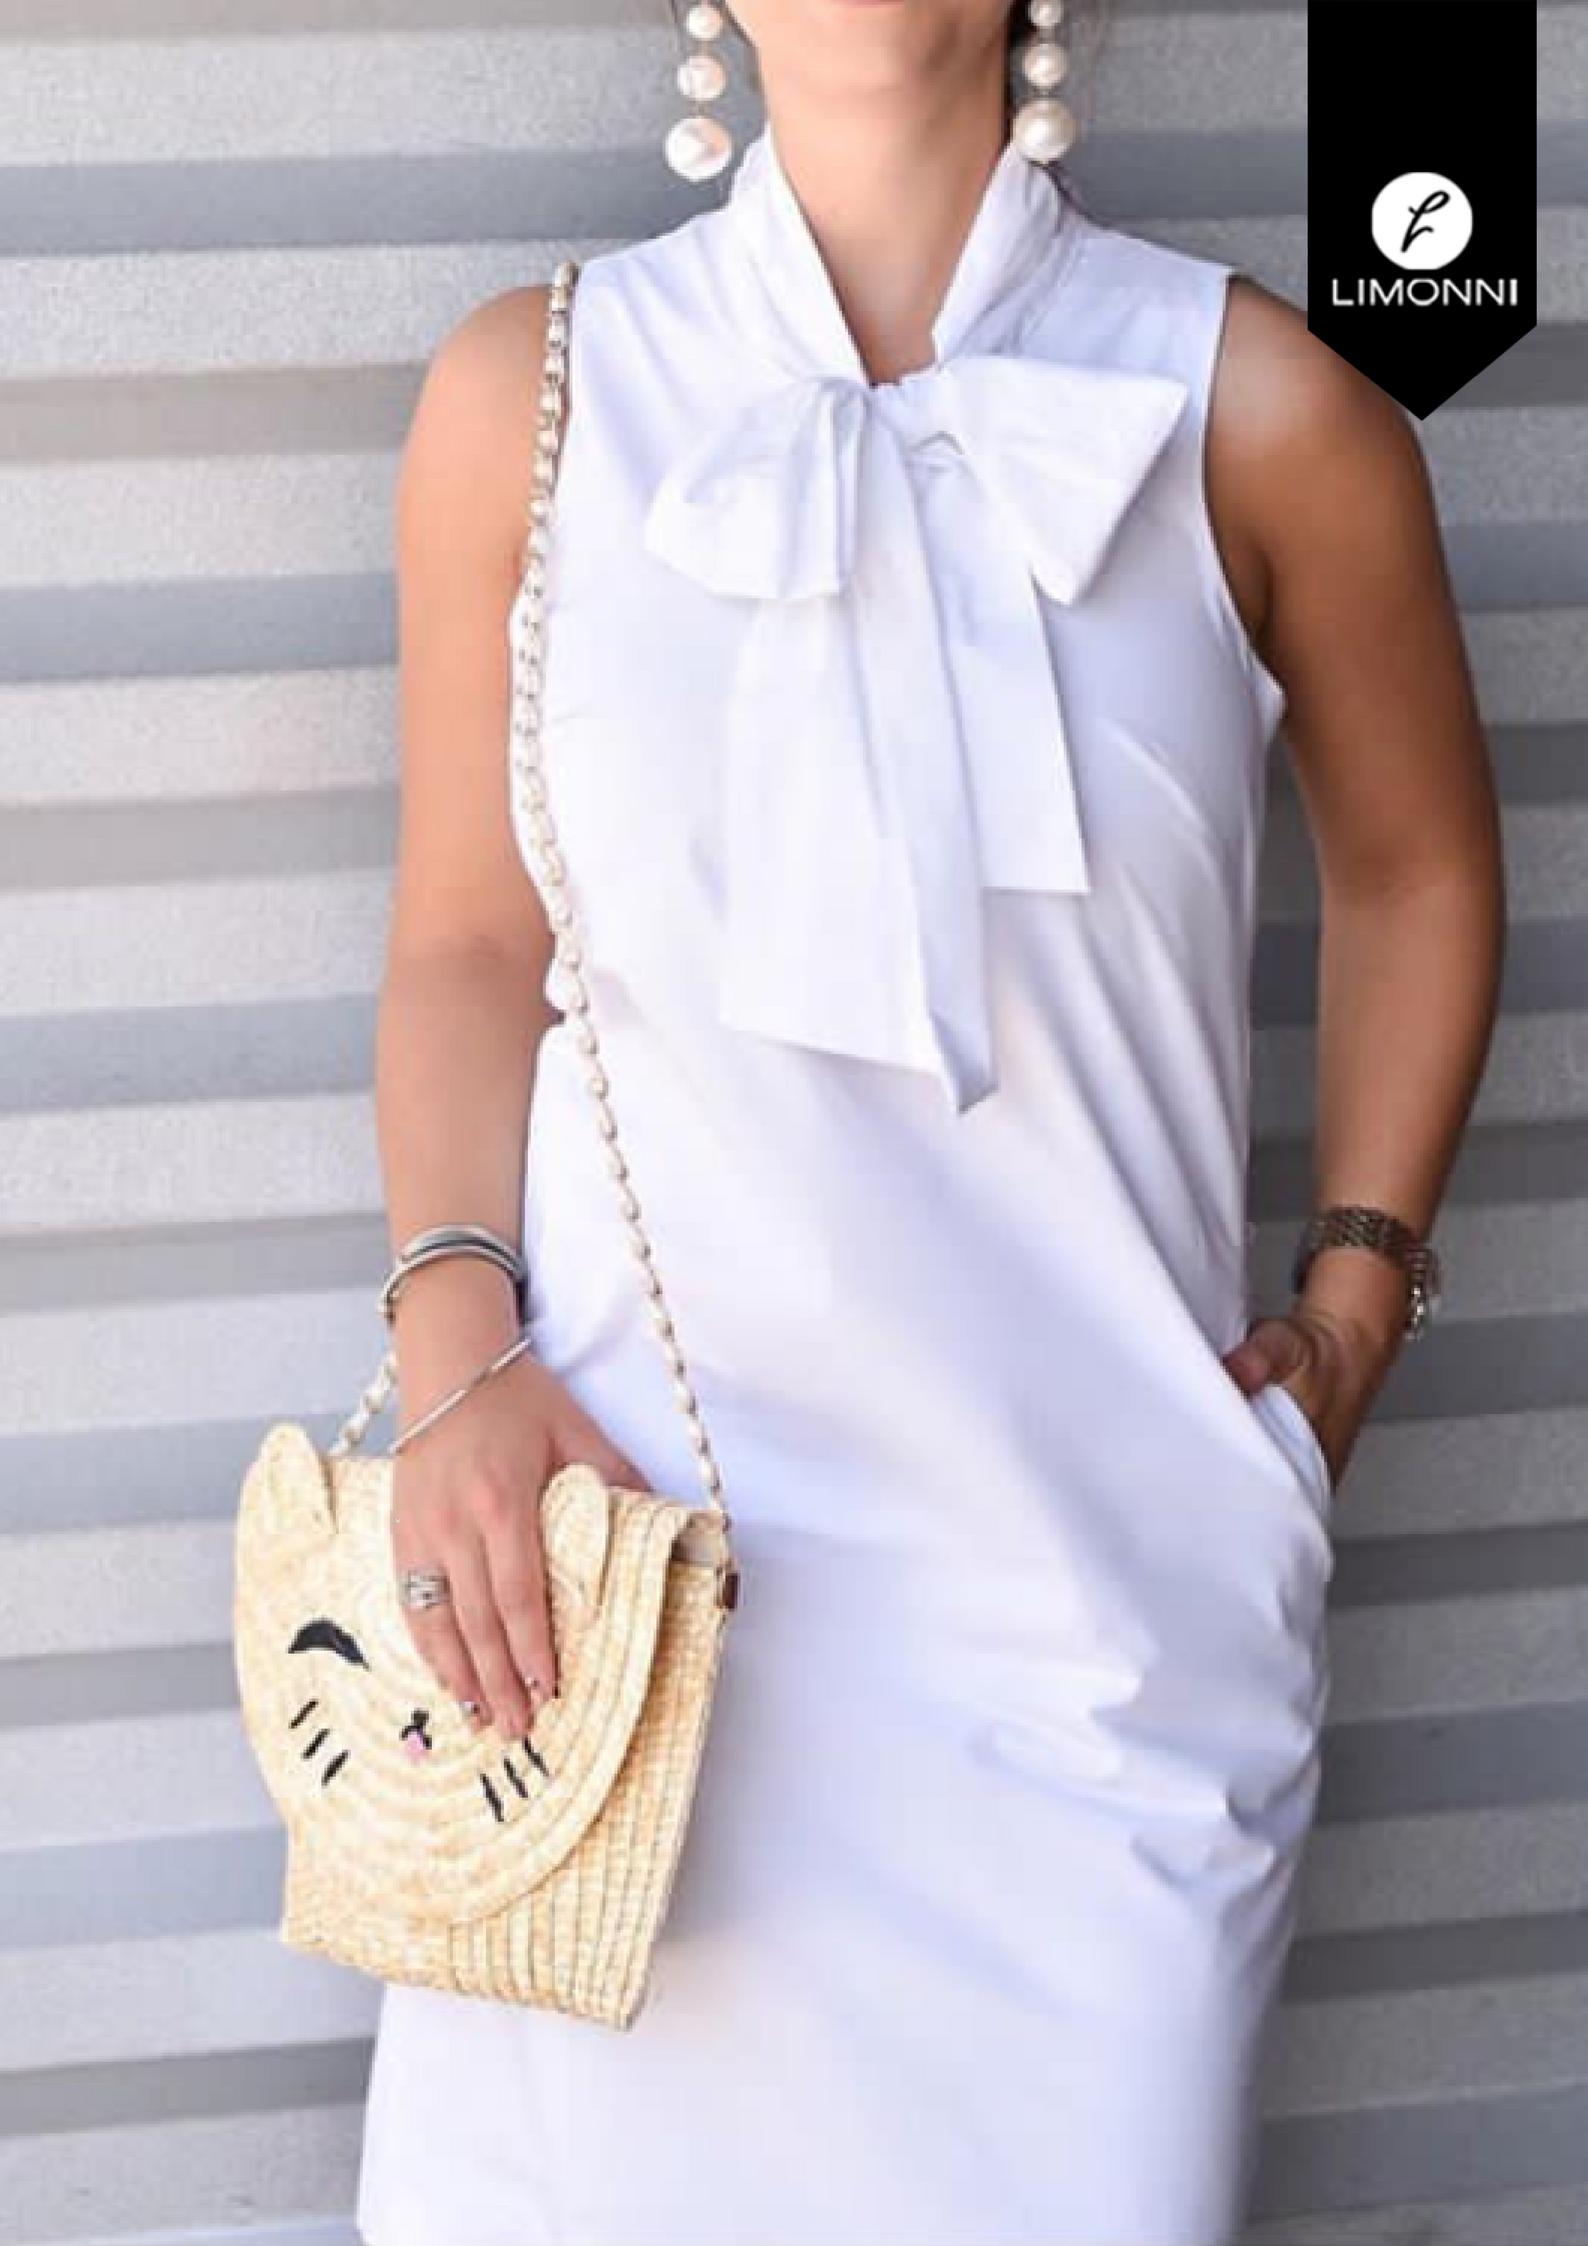 Vestidos para mujer Limonni Bennett LI1309 Cortos Casuales